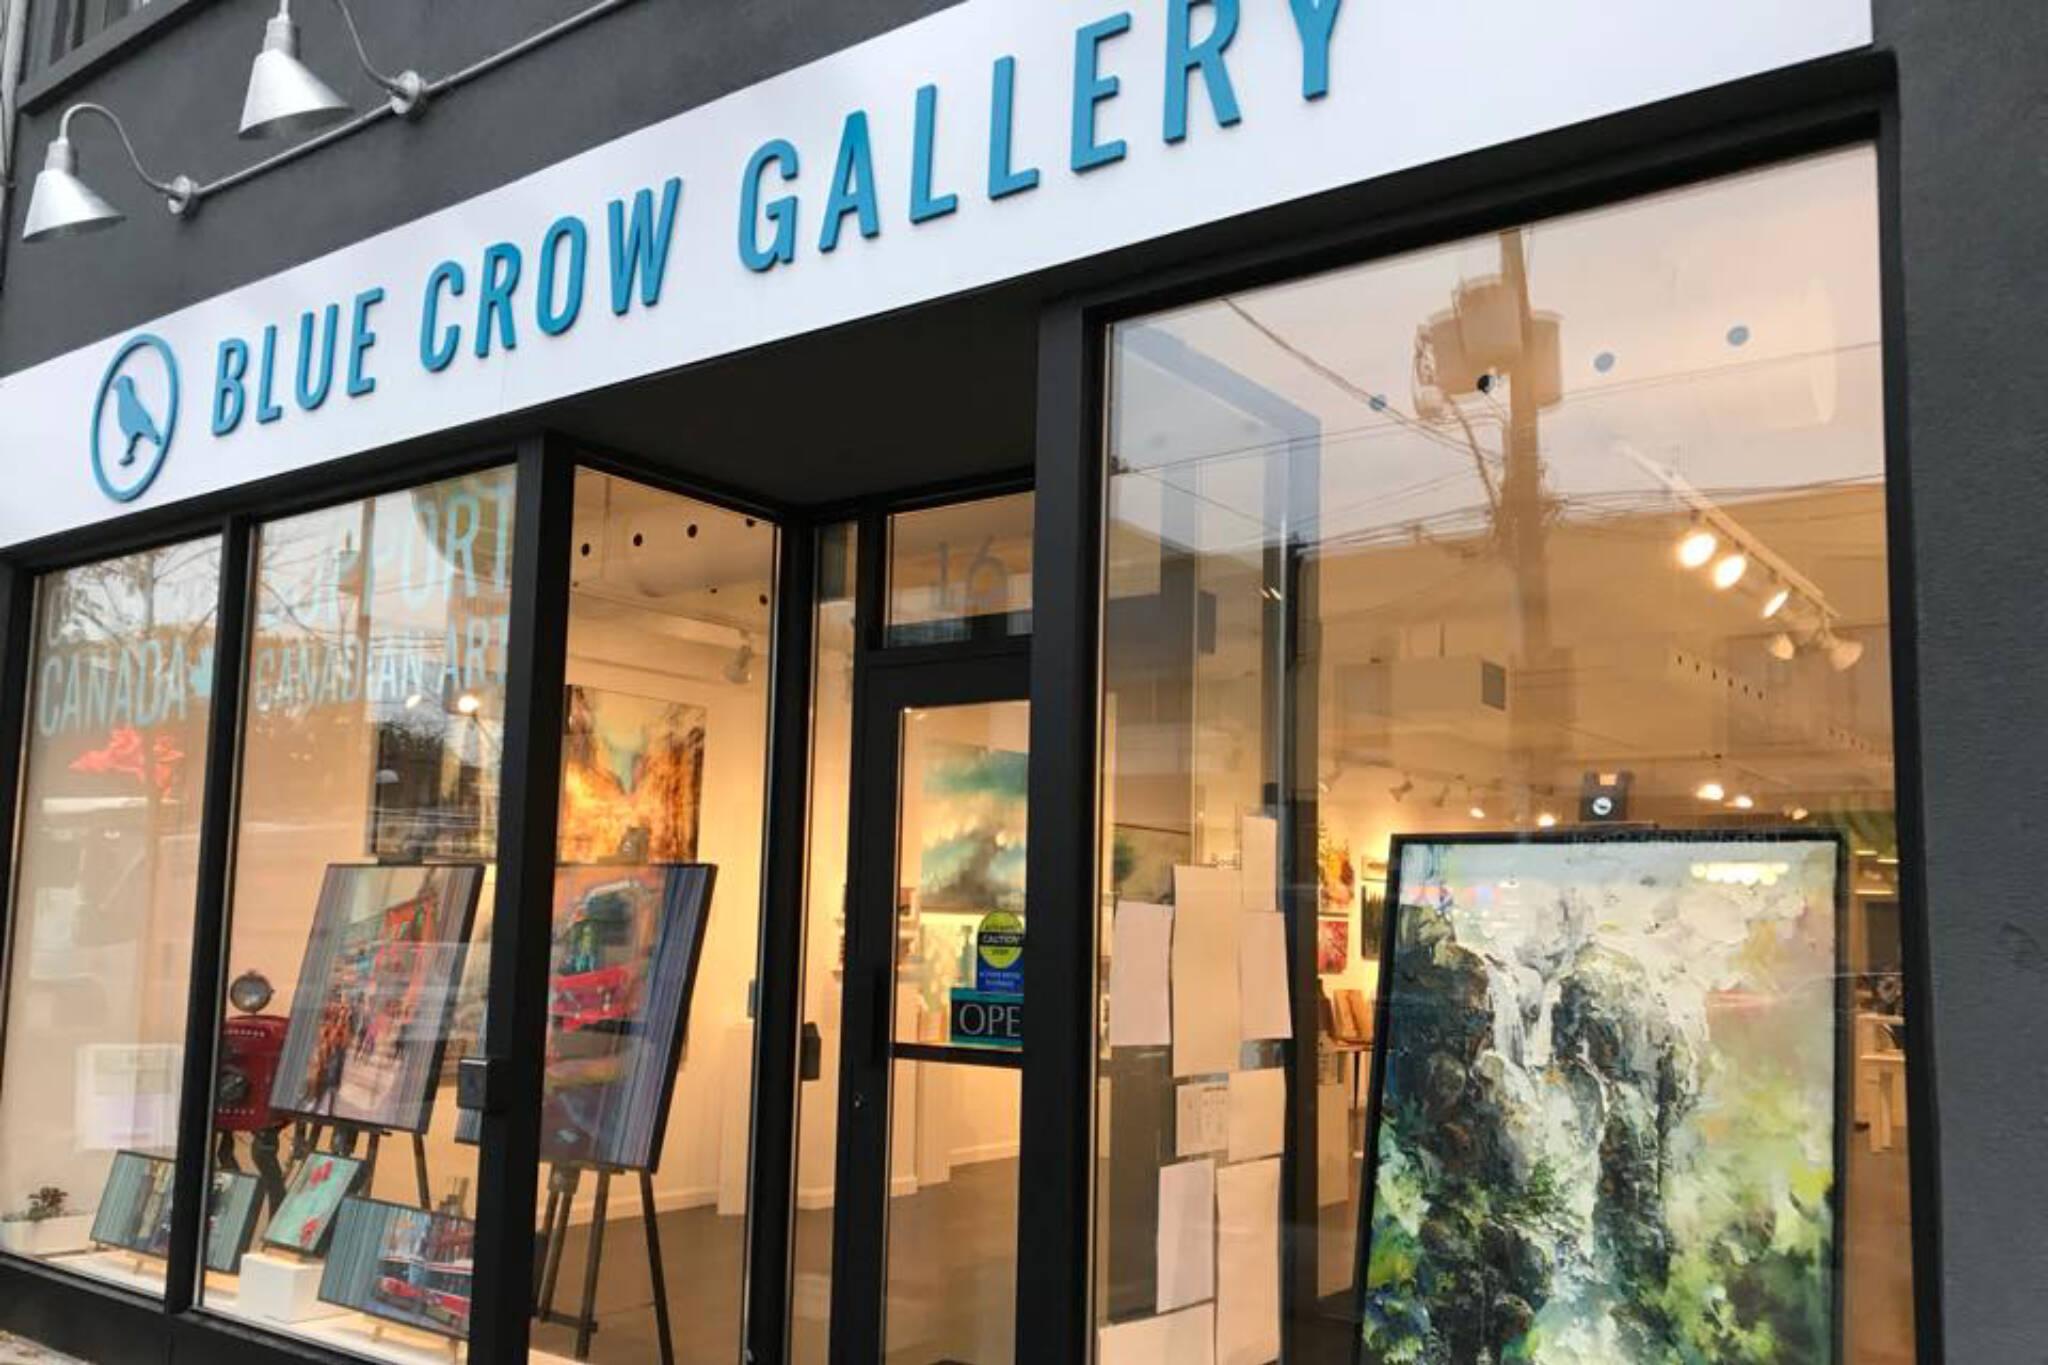 blue crow gallery toronto